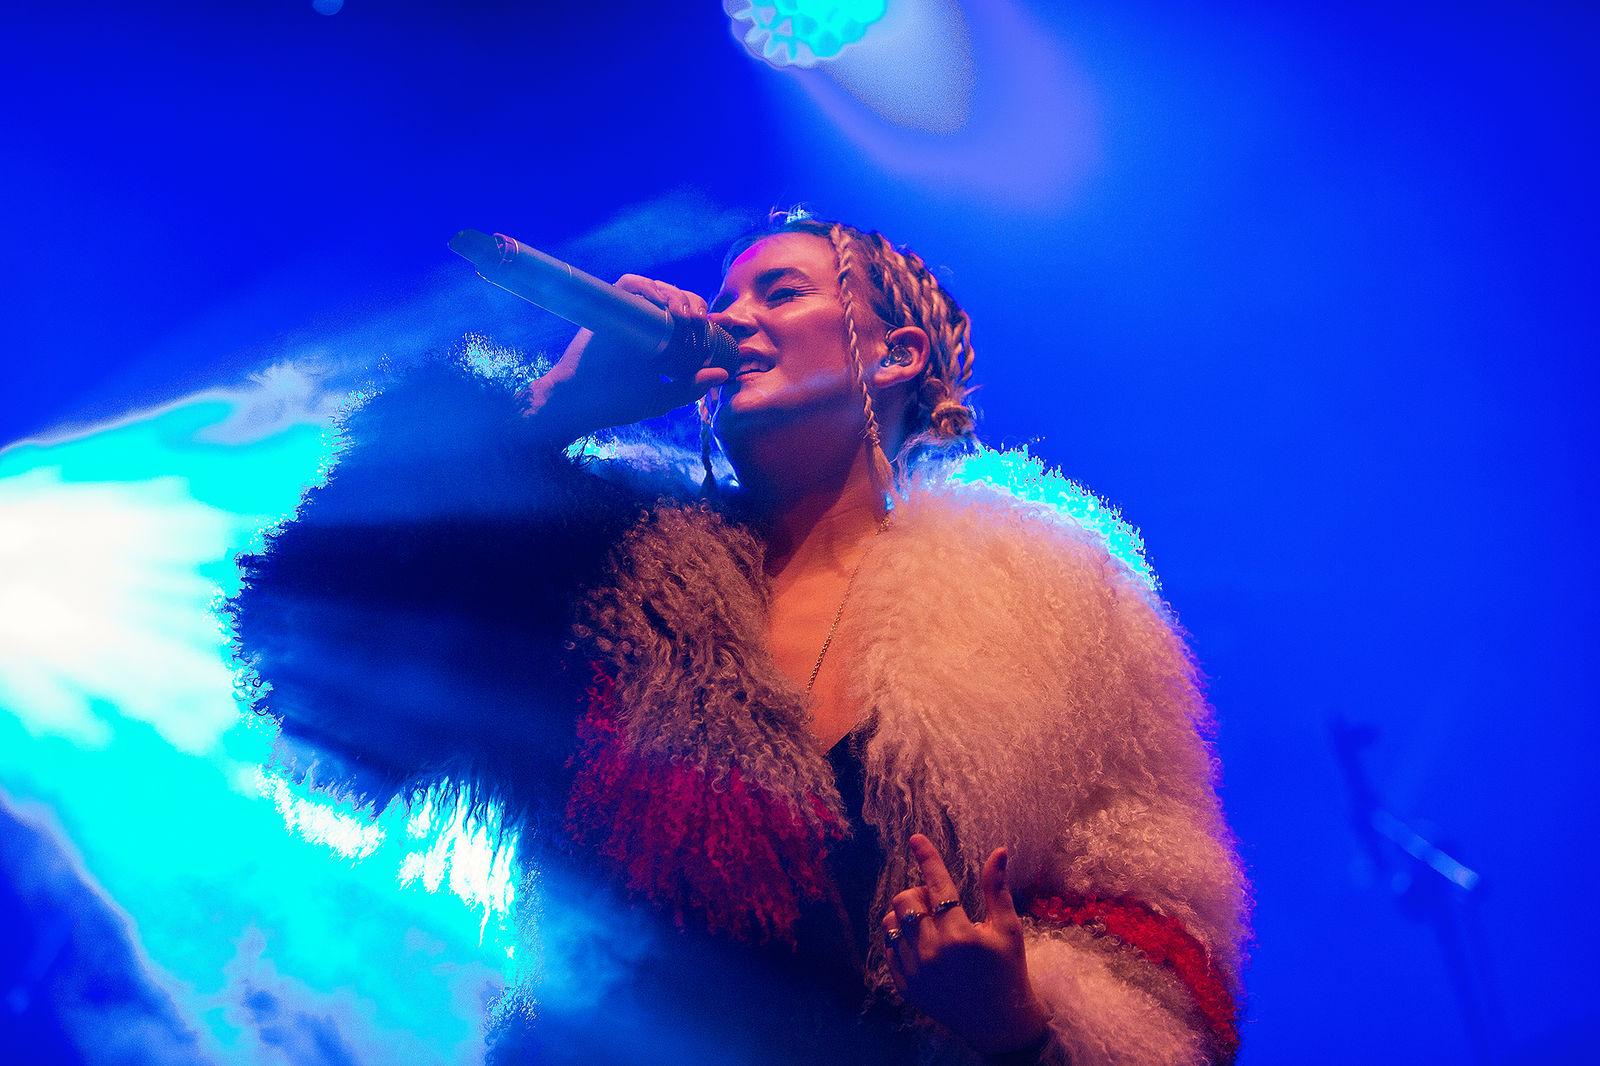 Anne Marie at V Festival 2016 by Bianca Barrett